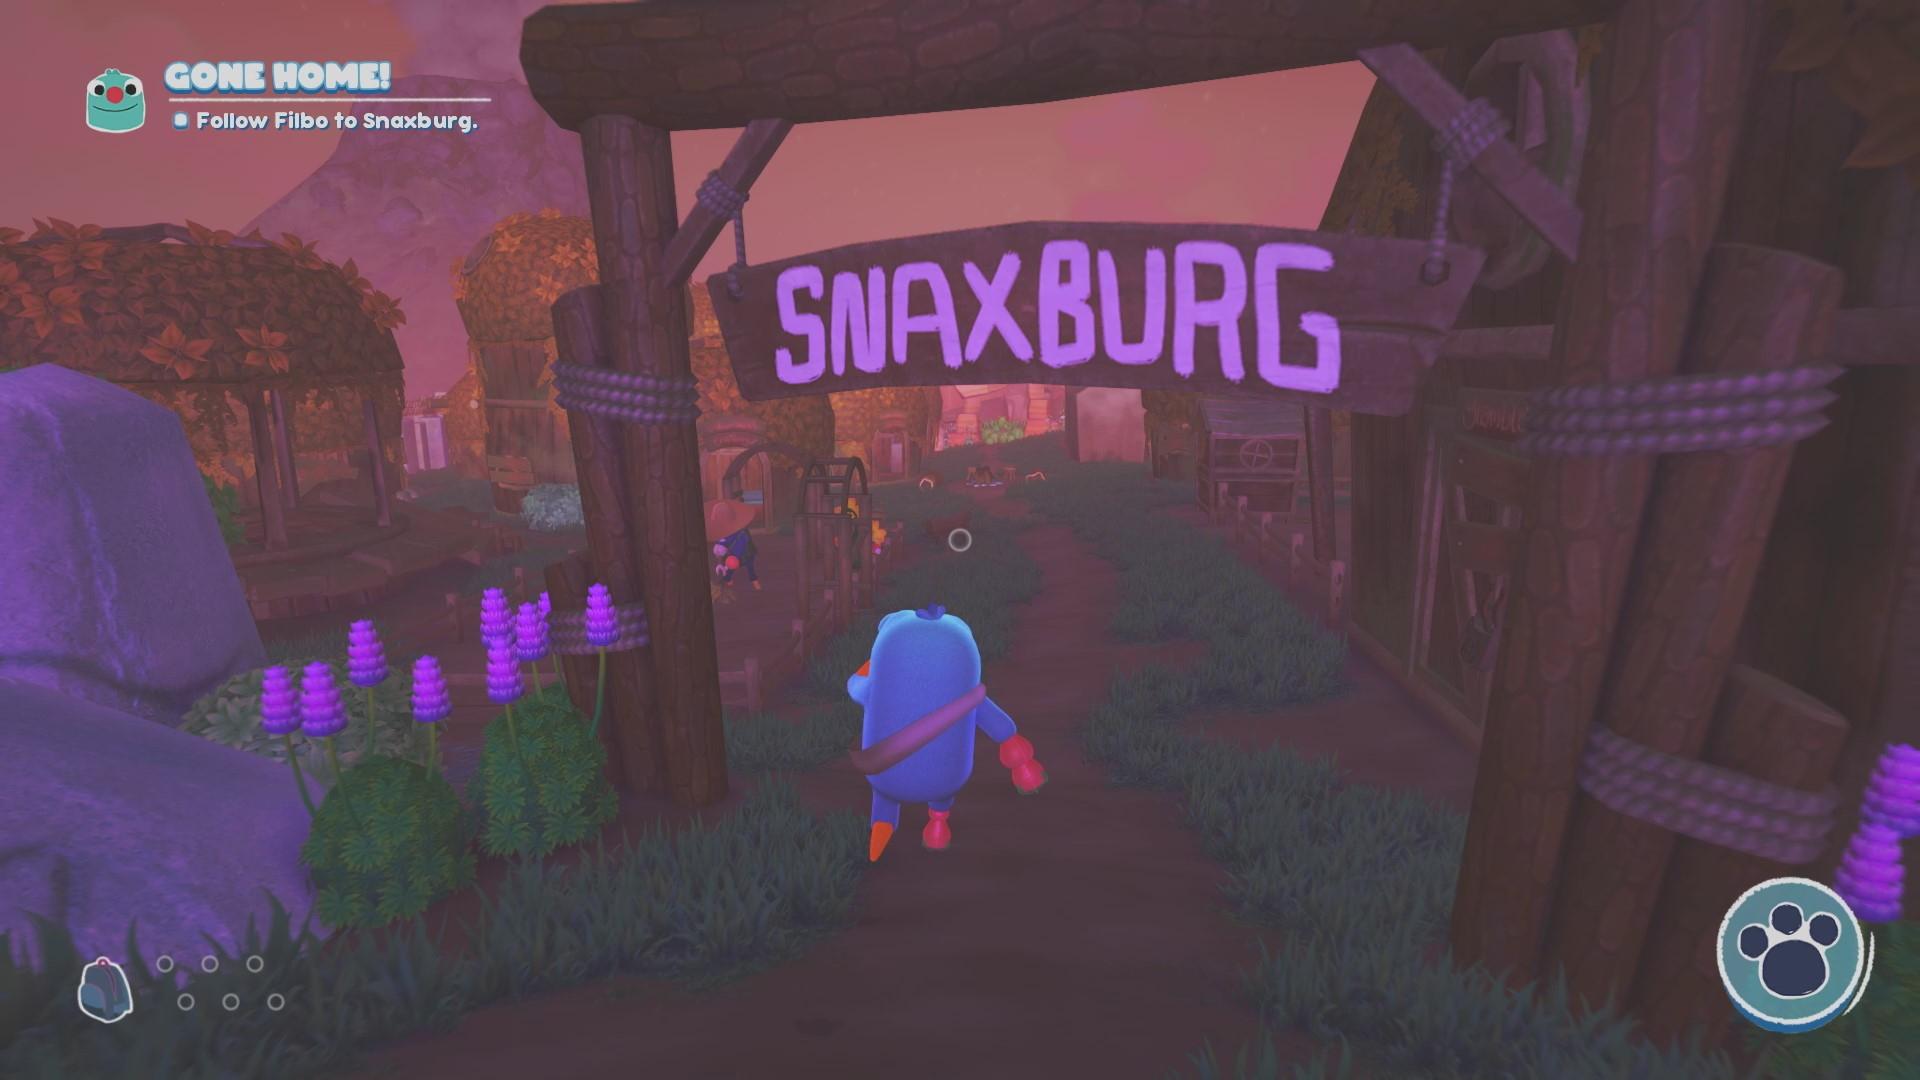 Filbo leads me to Snaxburg!